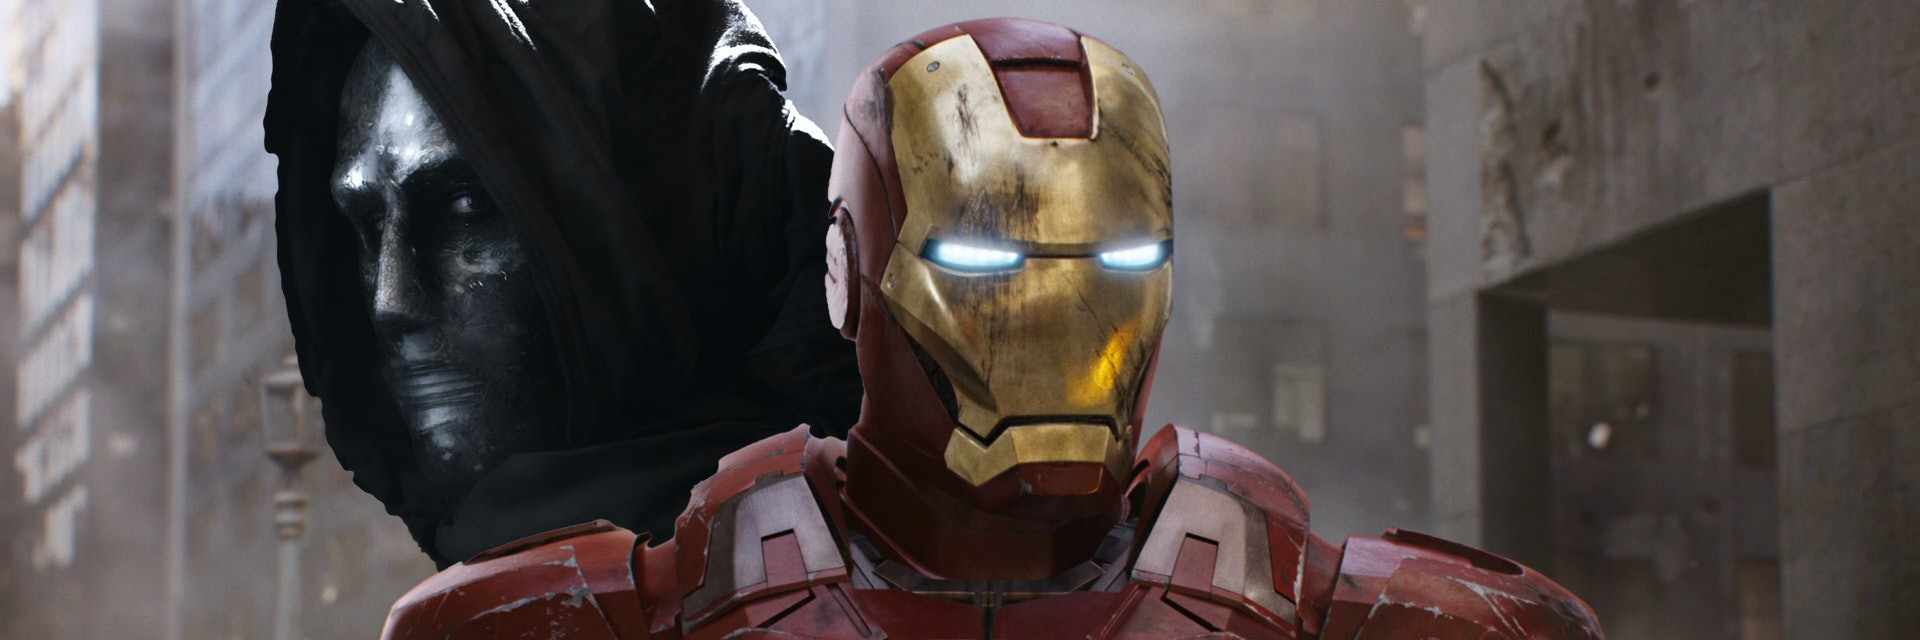 Doctor Doom Iron Man